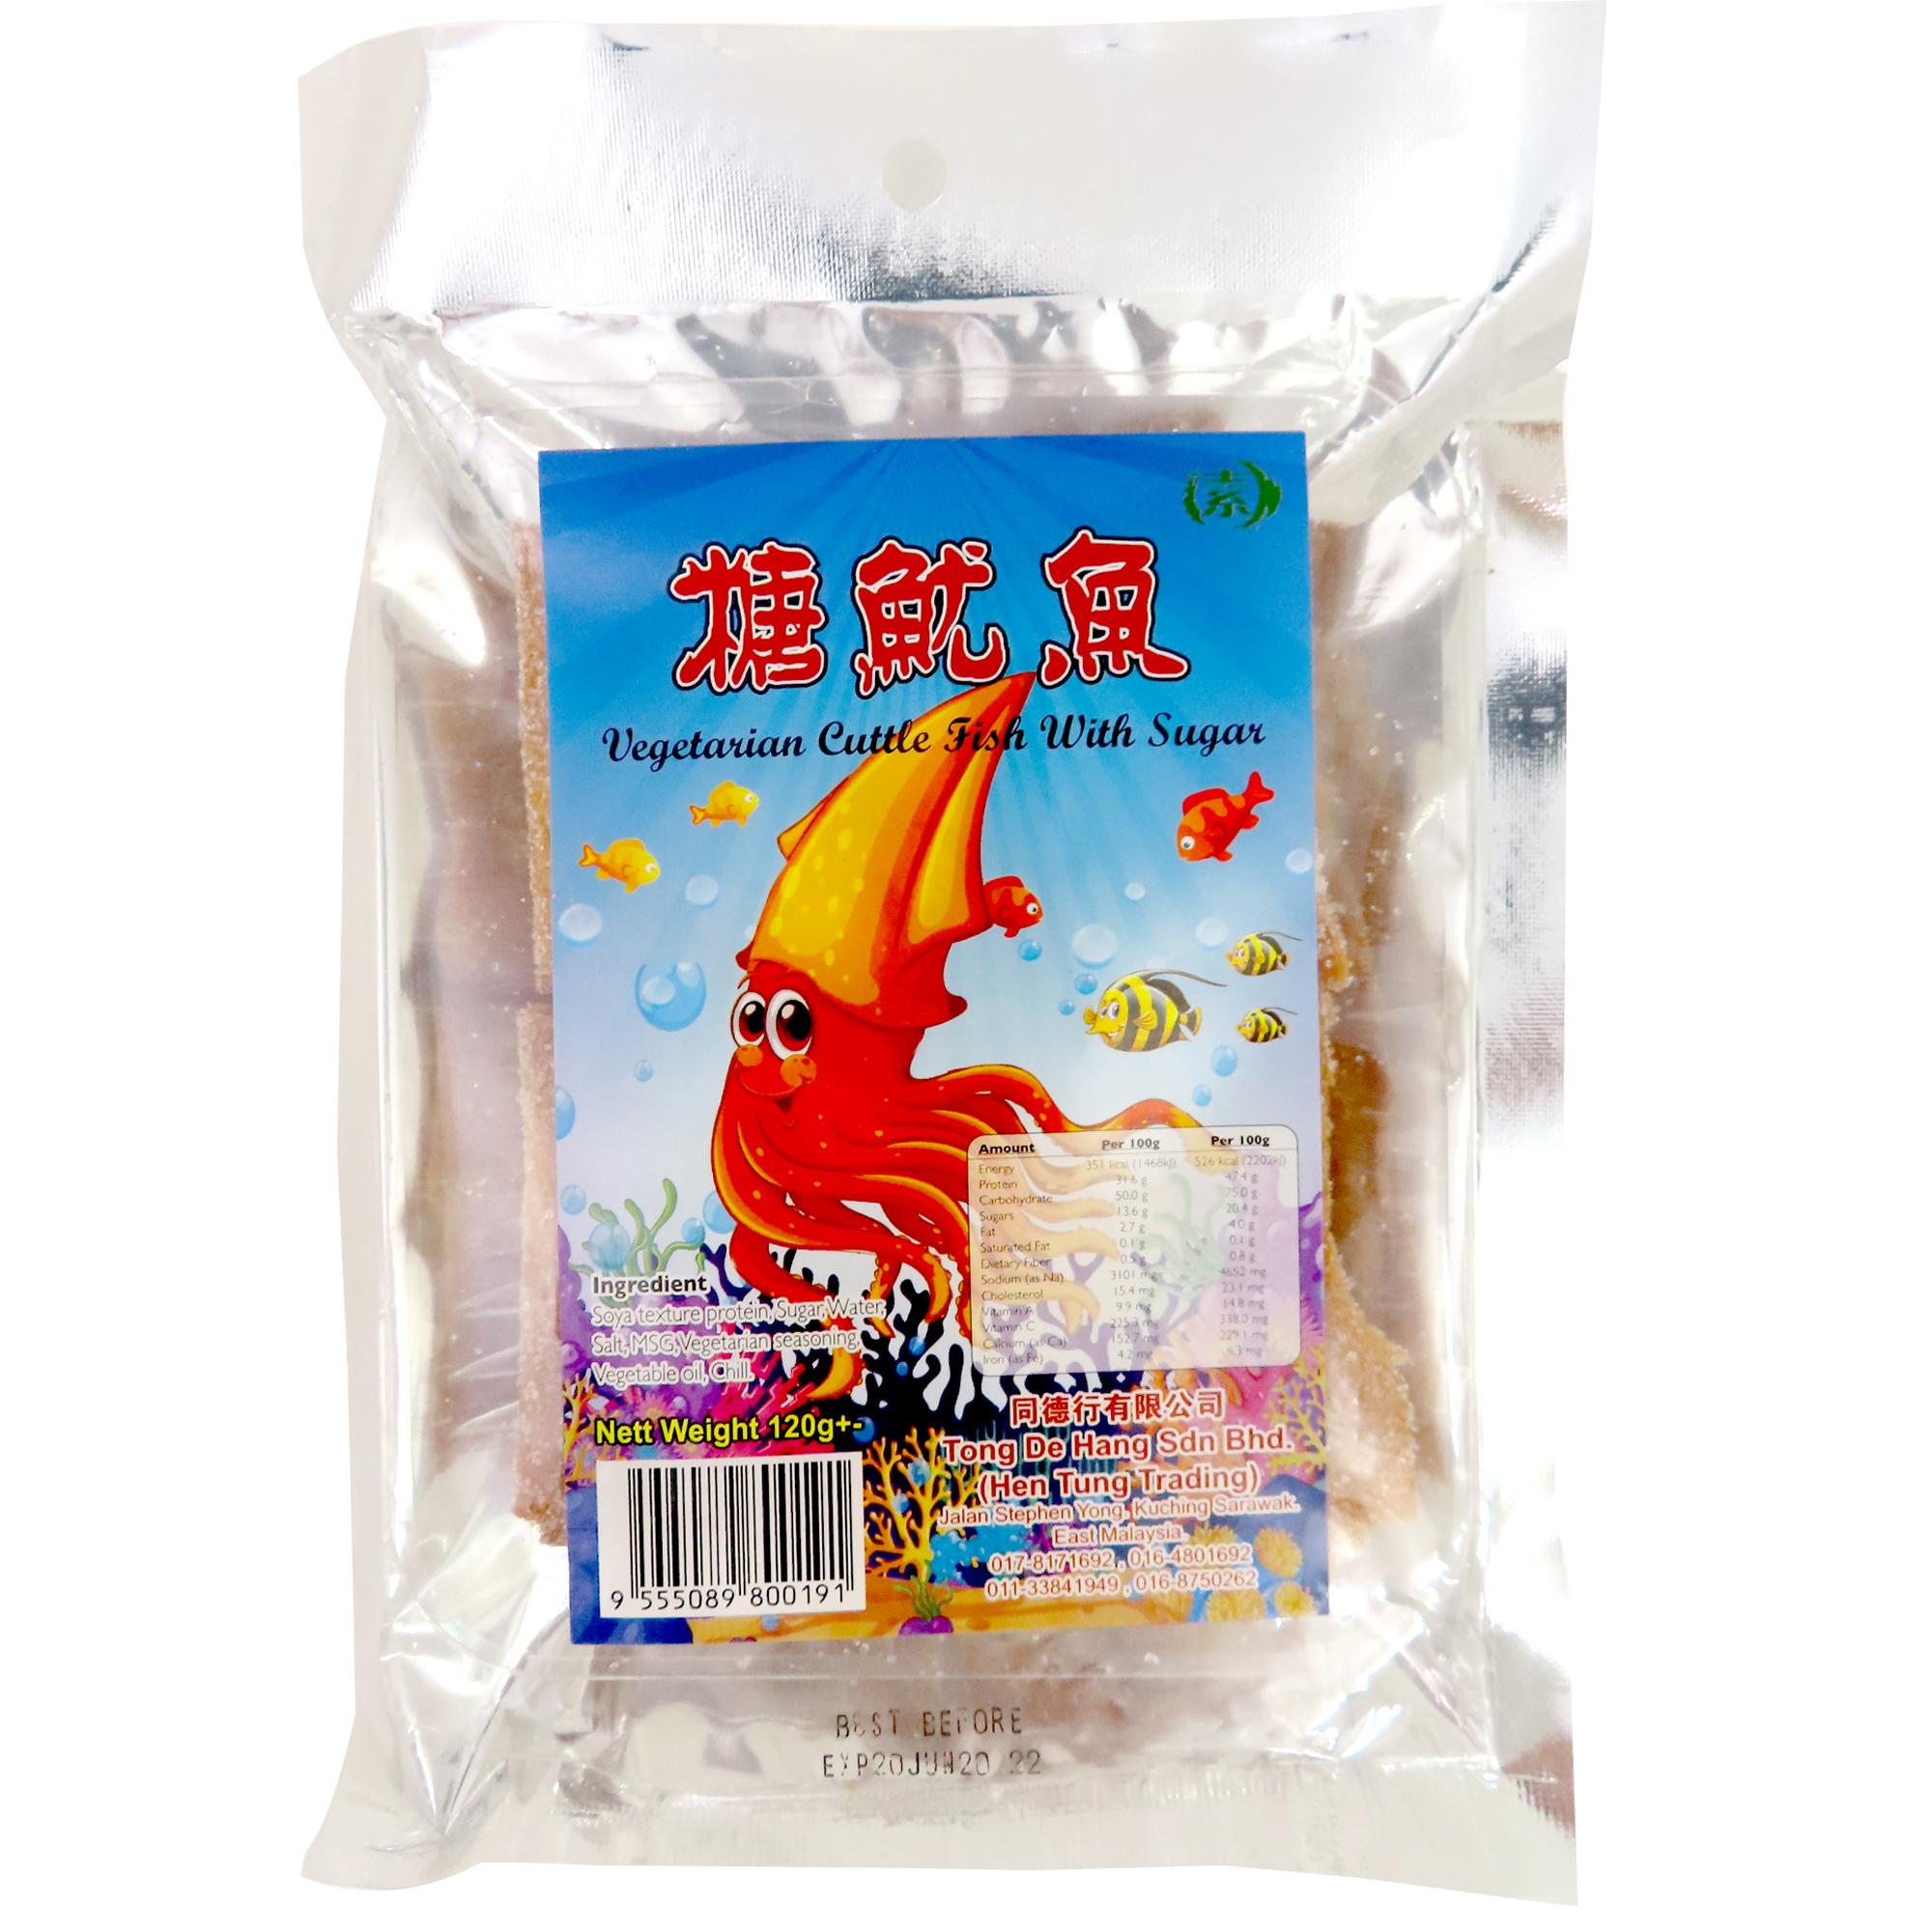 Image Cutter Fish W Sugar 同德行- 糖鱿鱼 120grams